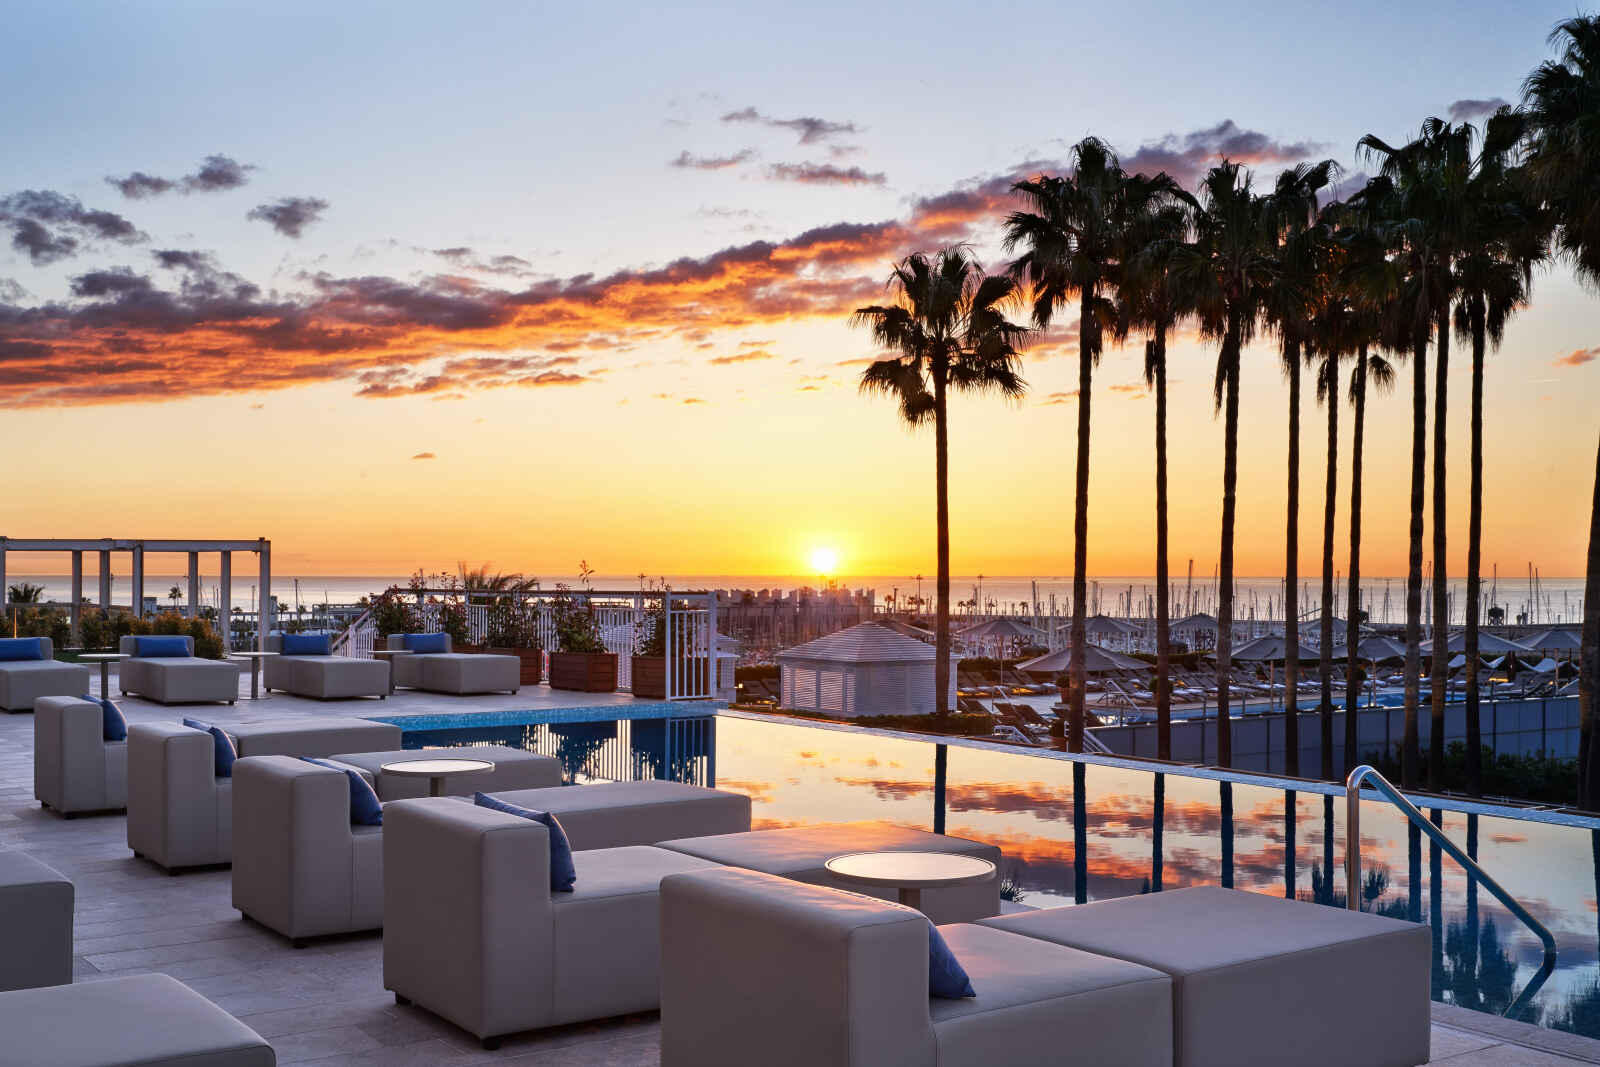 Espagne : Hotel Arts Barcelona - Barcelone